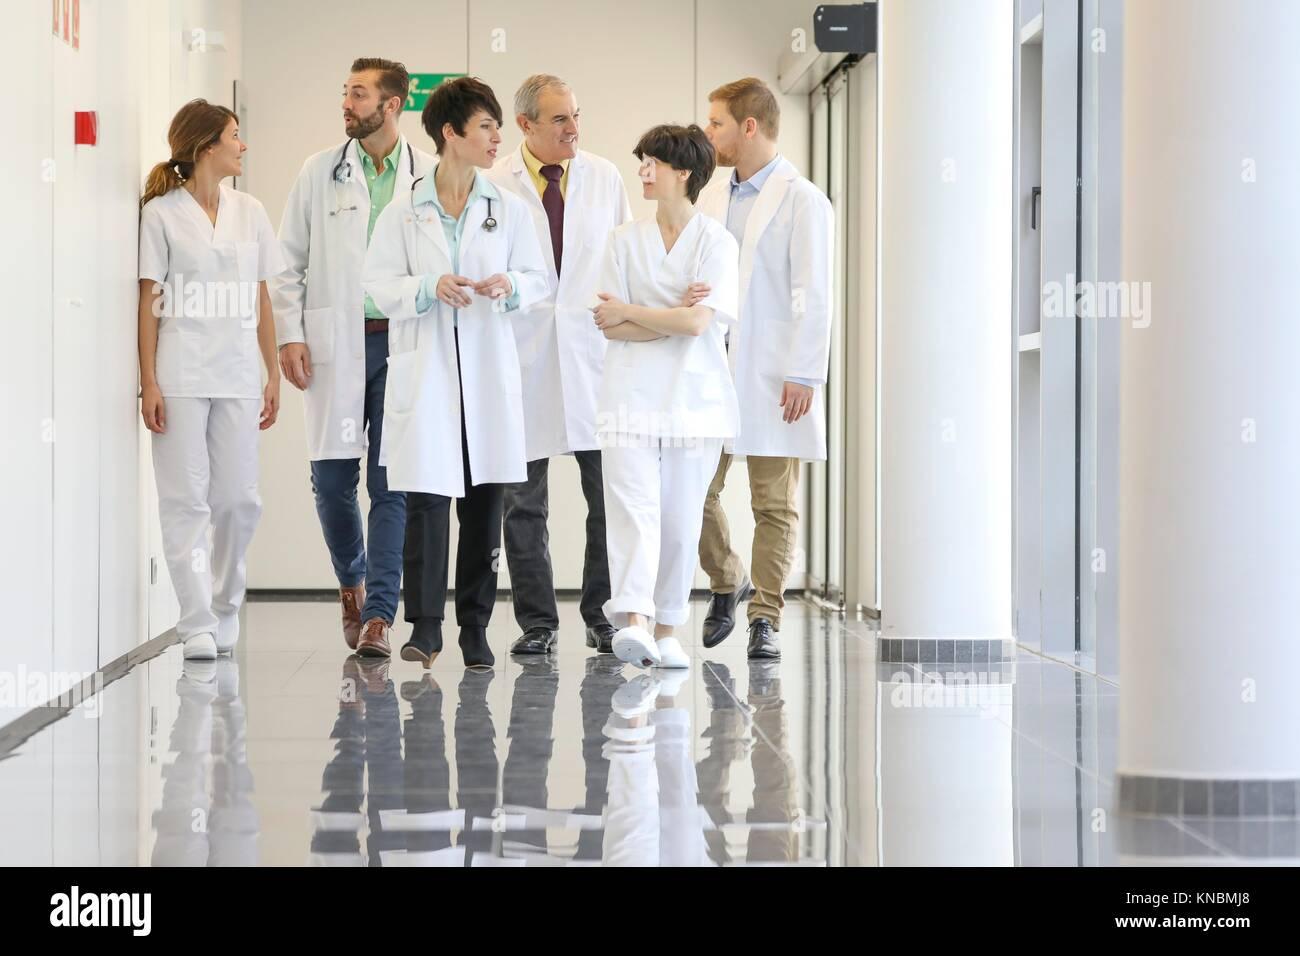 Doctors and nurses walking in corridor, Hospital - Stock Image